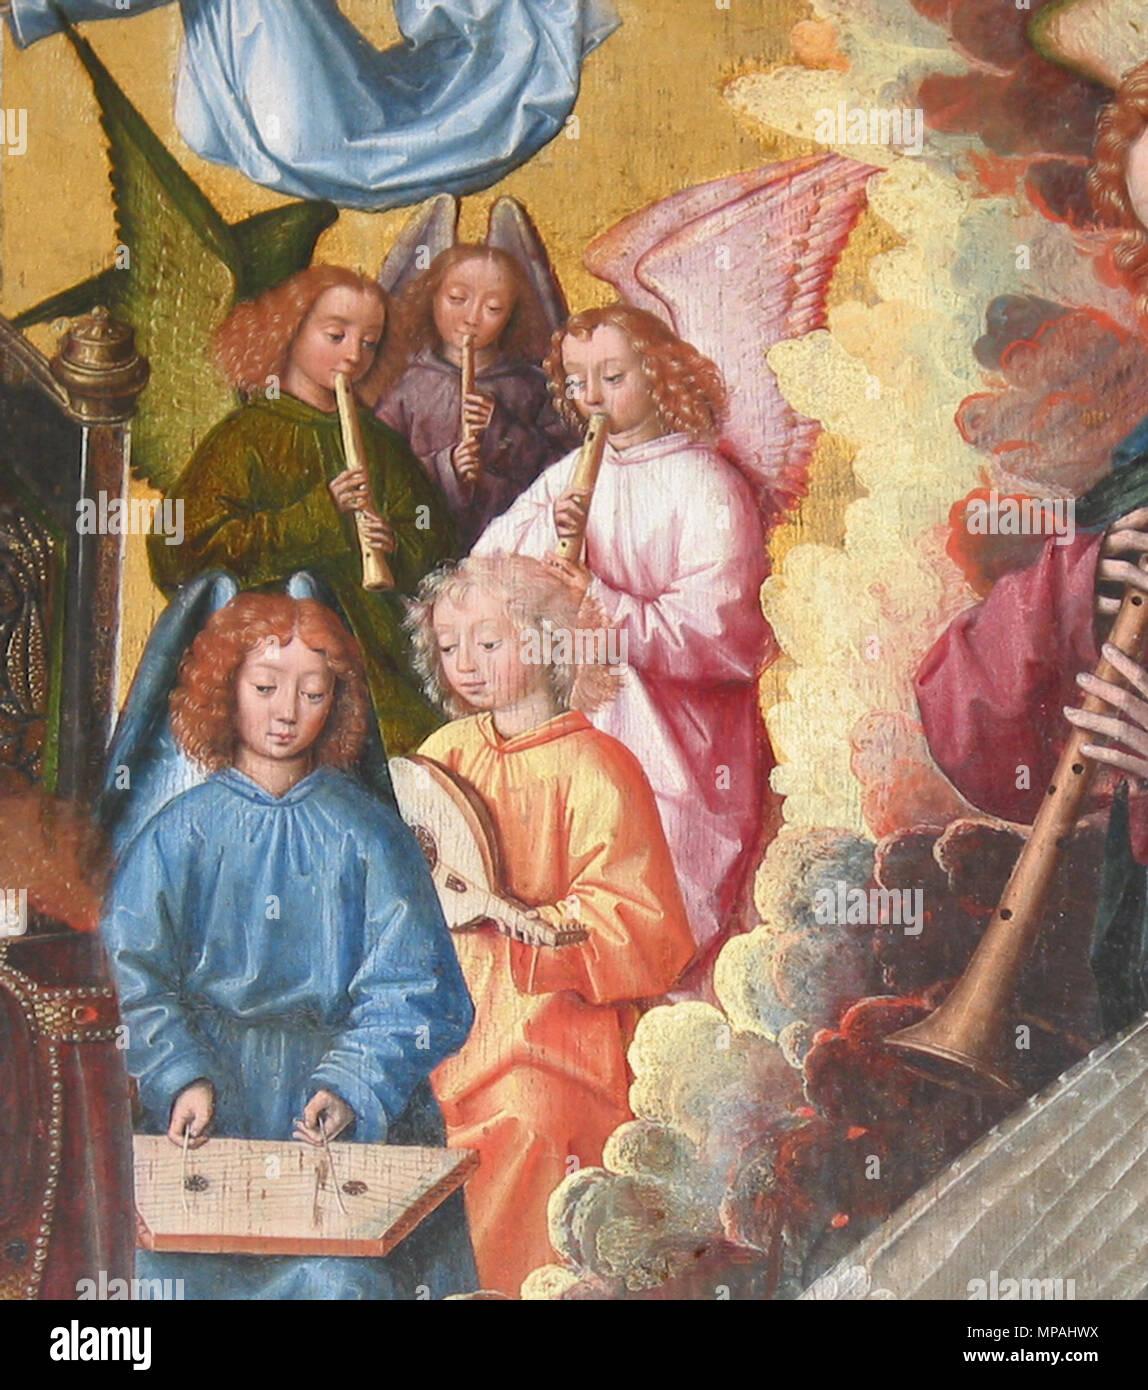 Englisch: Maria, Königin des Himmels, oben rechts Detail: Musik ...